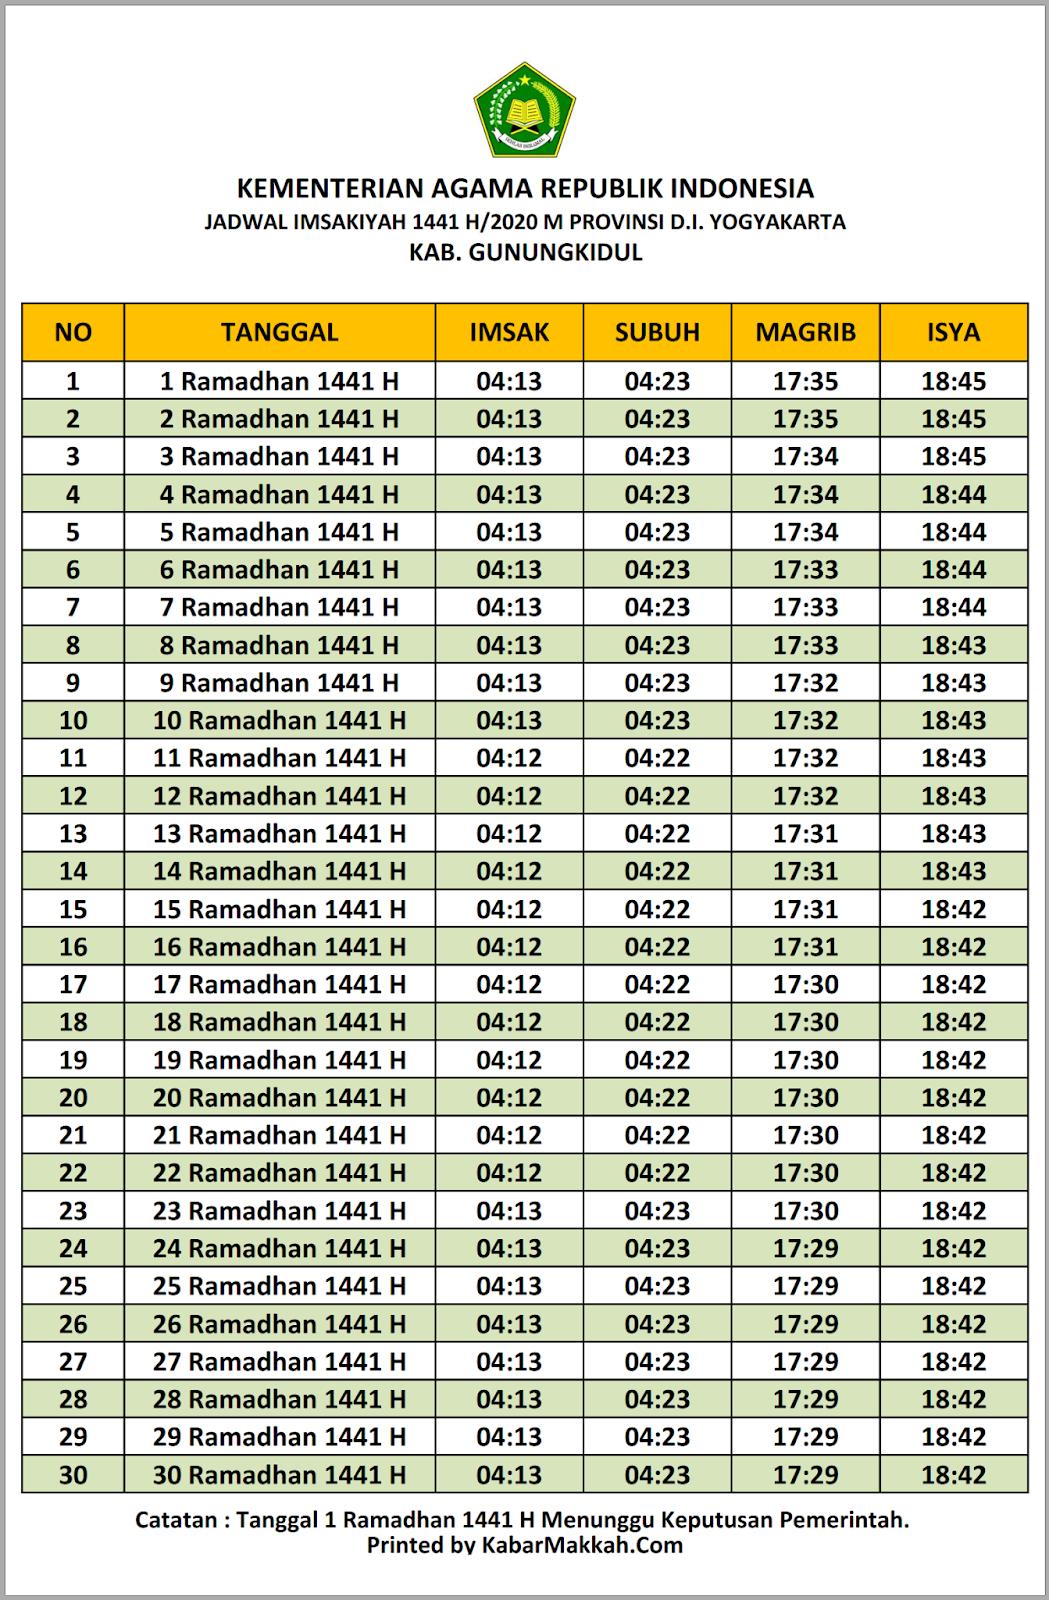 Jadwal Imsakiyah Gunung Kidul 2020